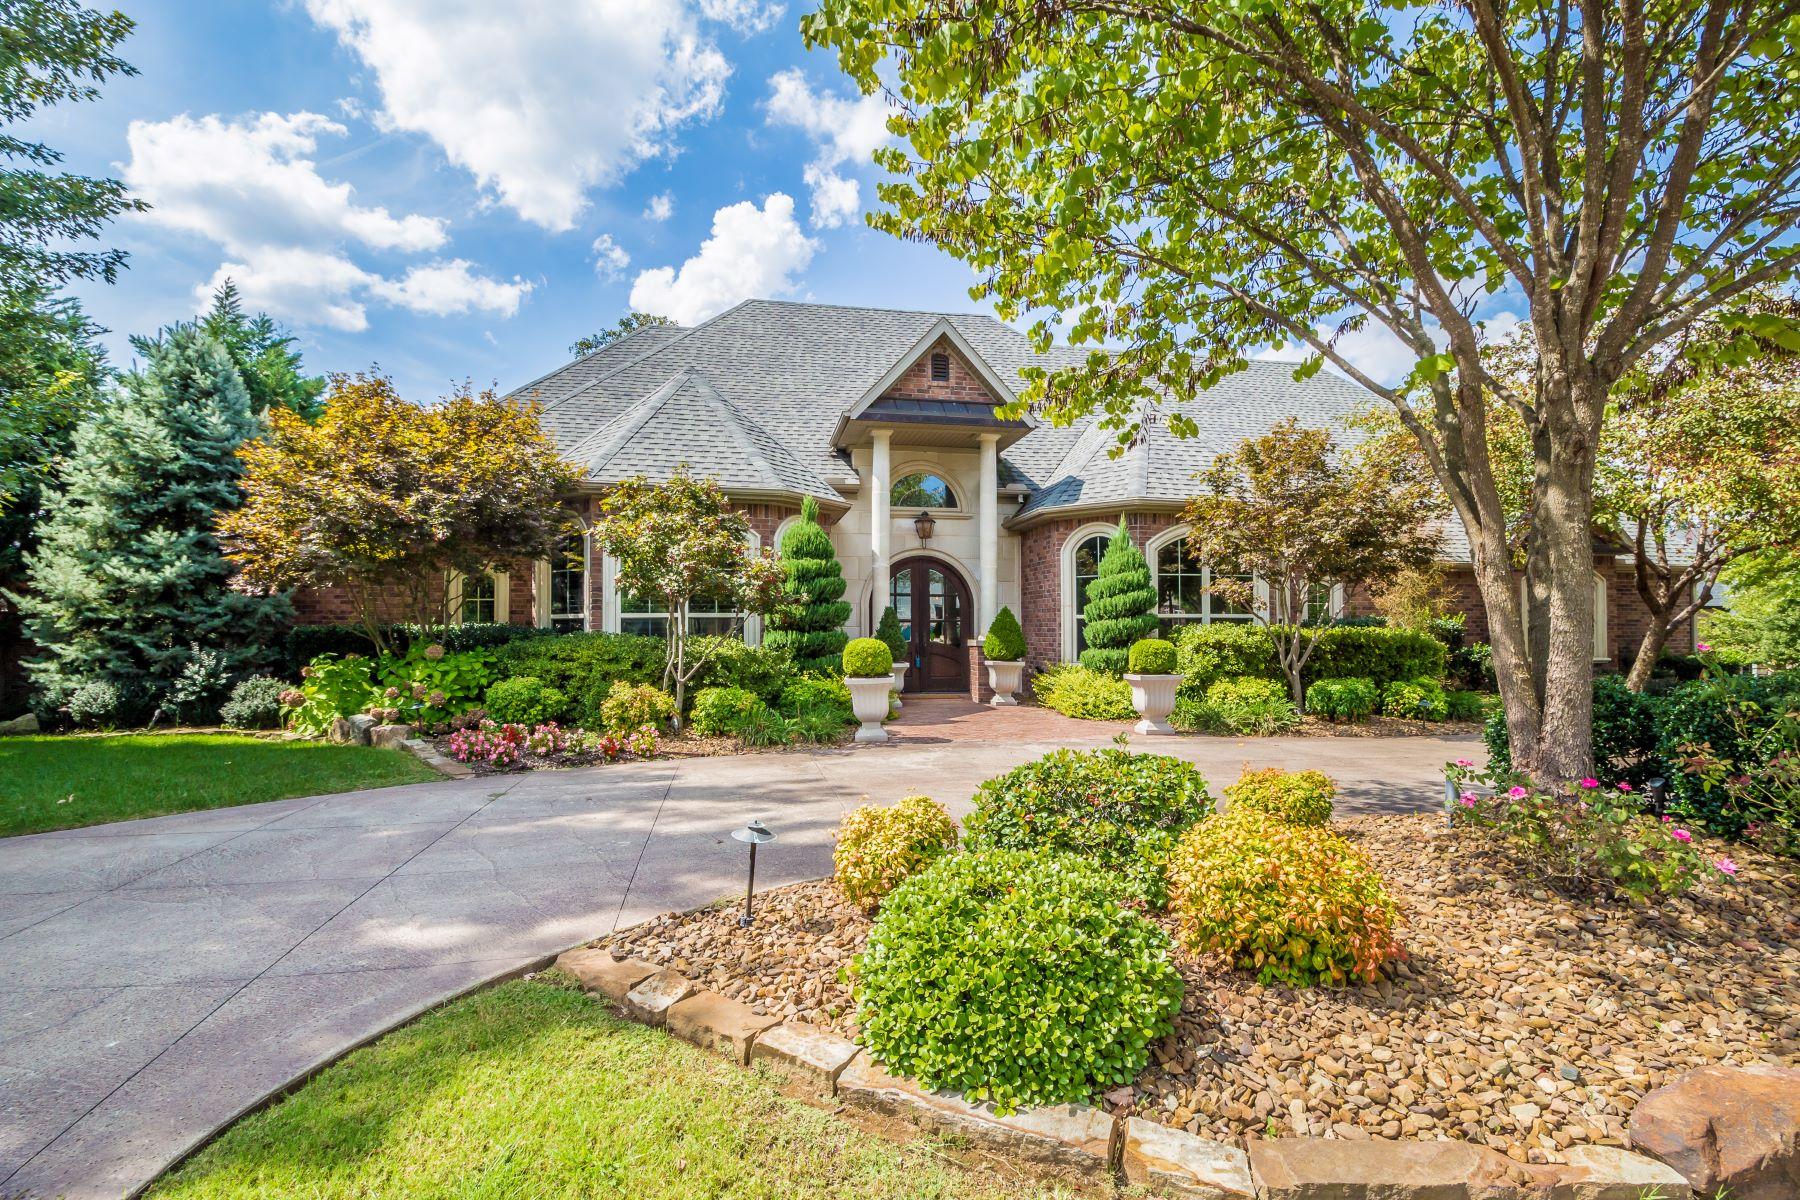 Single Family Homes for Sale at 22 W. Nottingham Lane Rogers, Arkansas 72758 United States